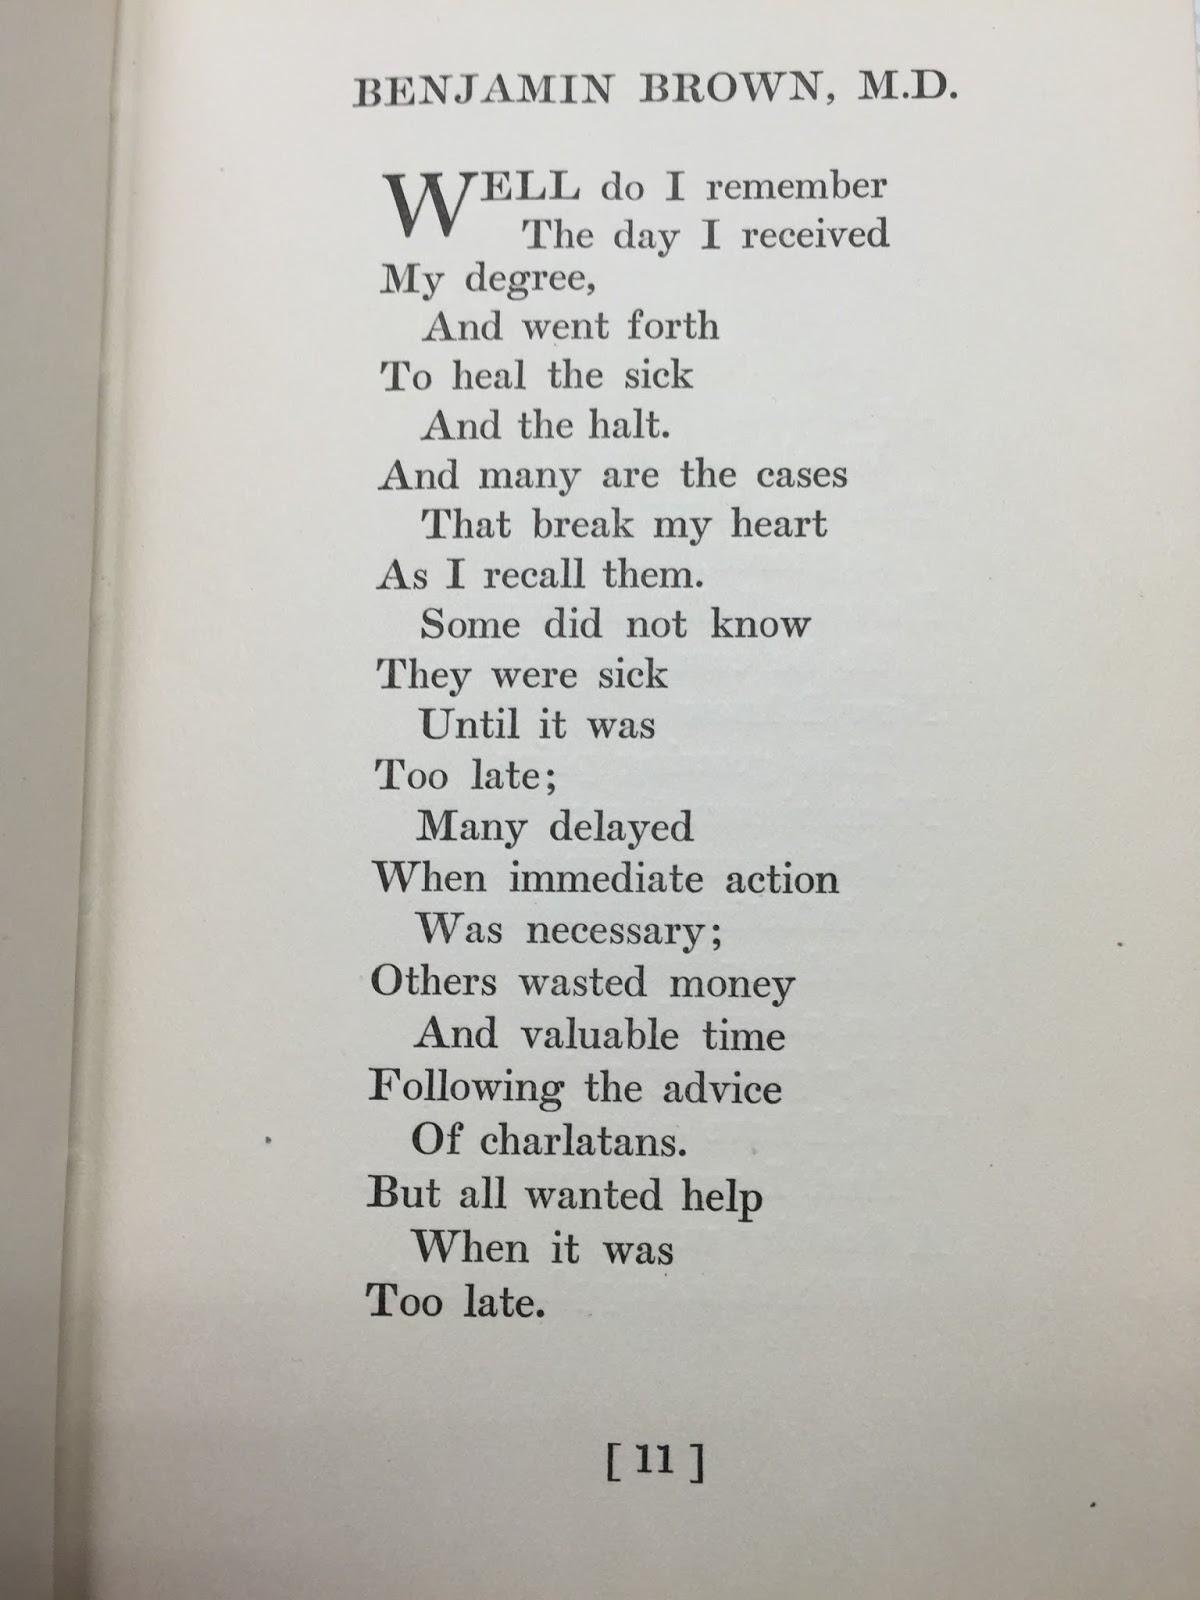 Doctoring essay poem story